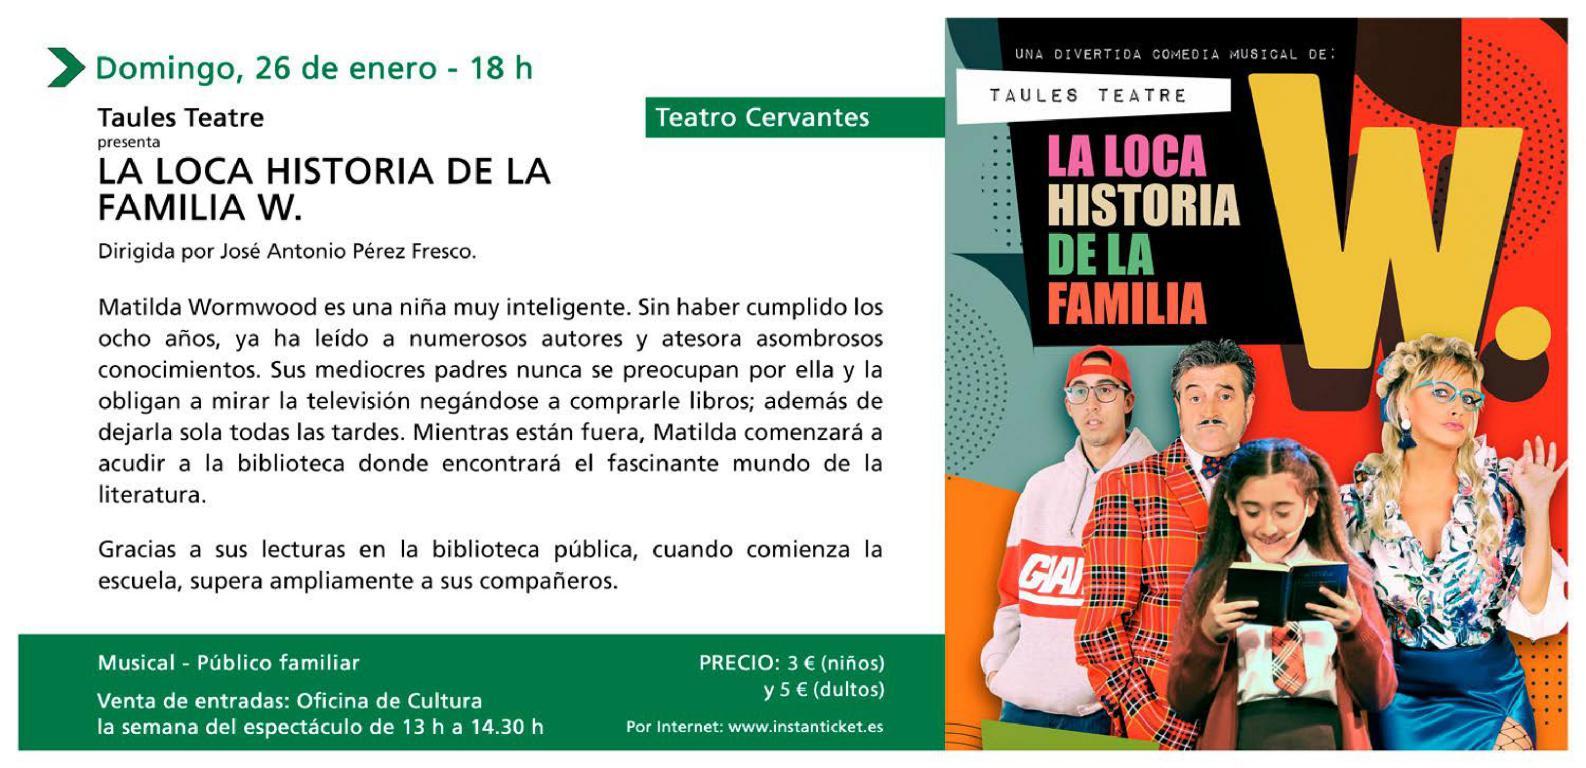 Programacin-Teatro-Cervantes-2020_page-0002.jpg